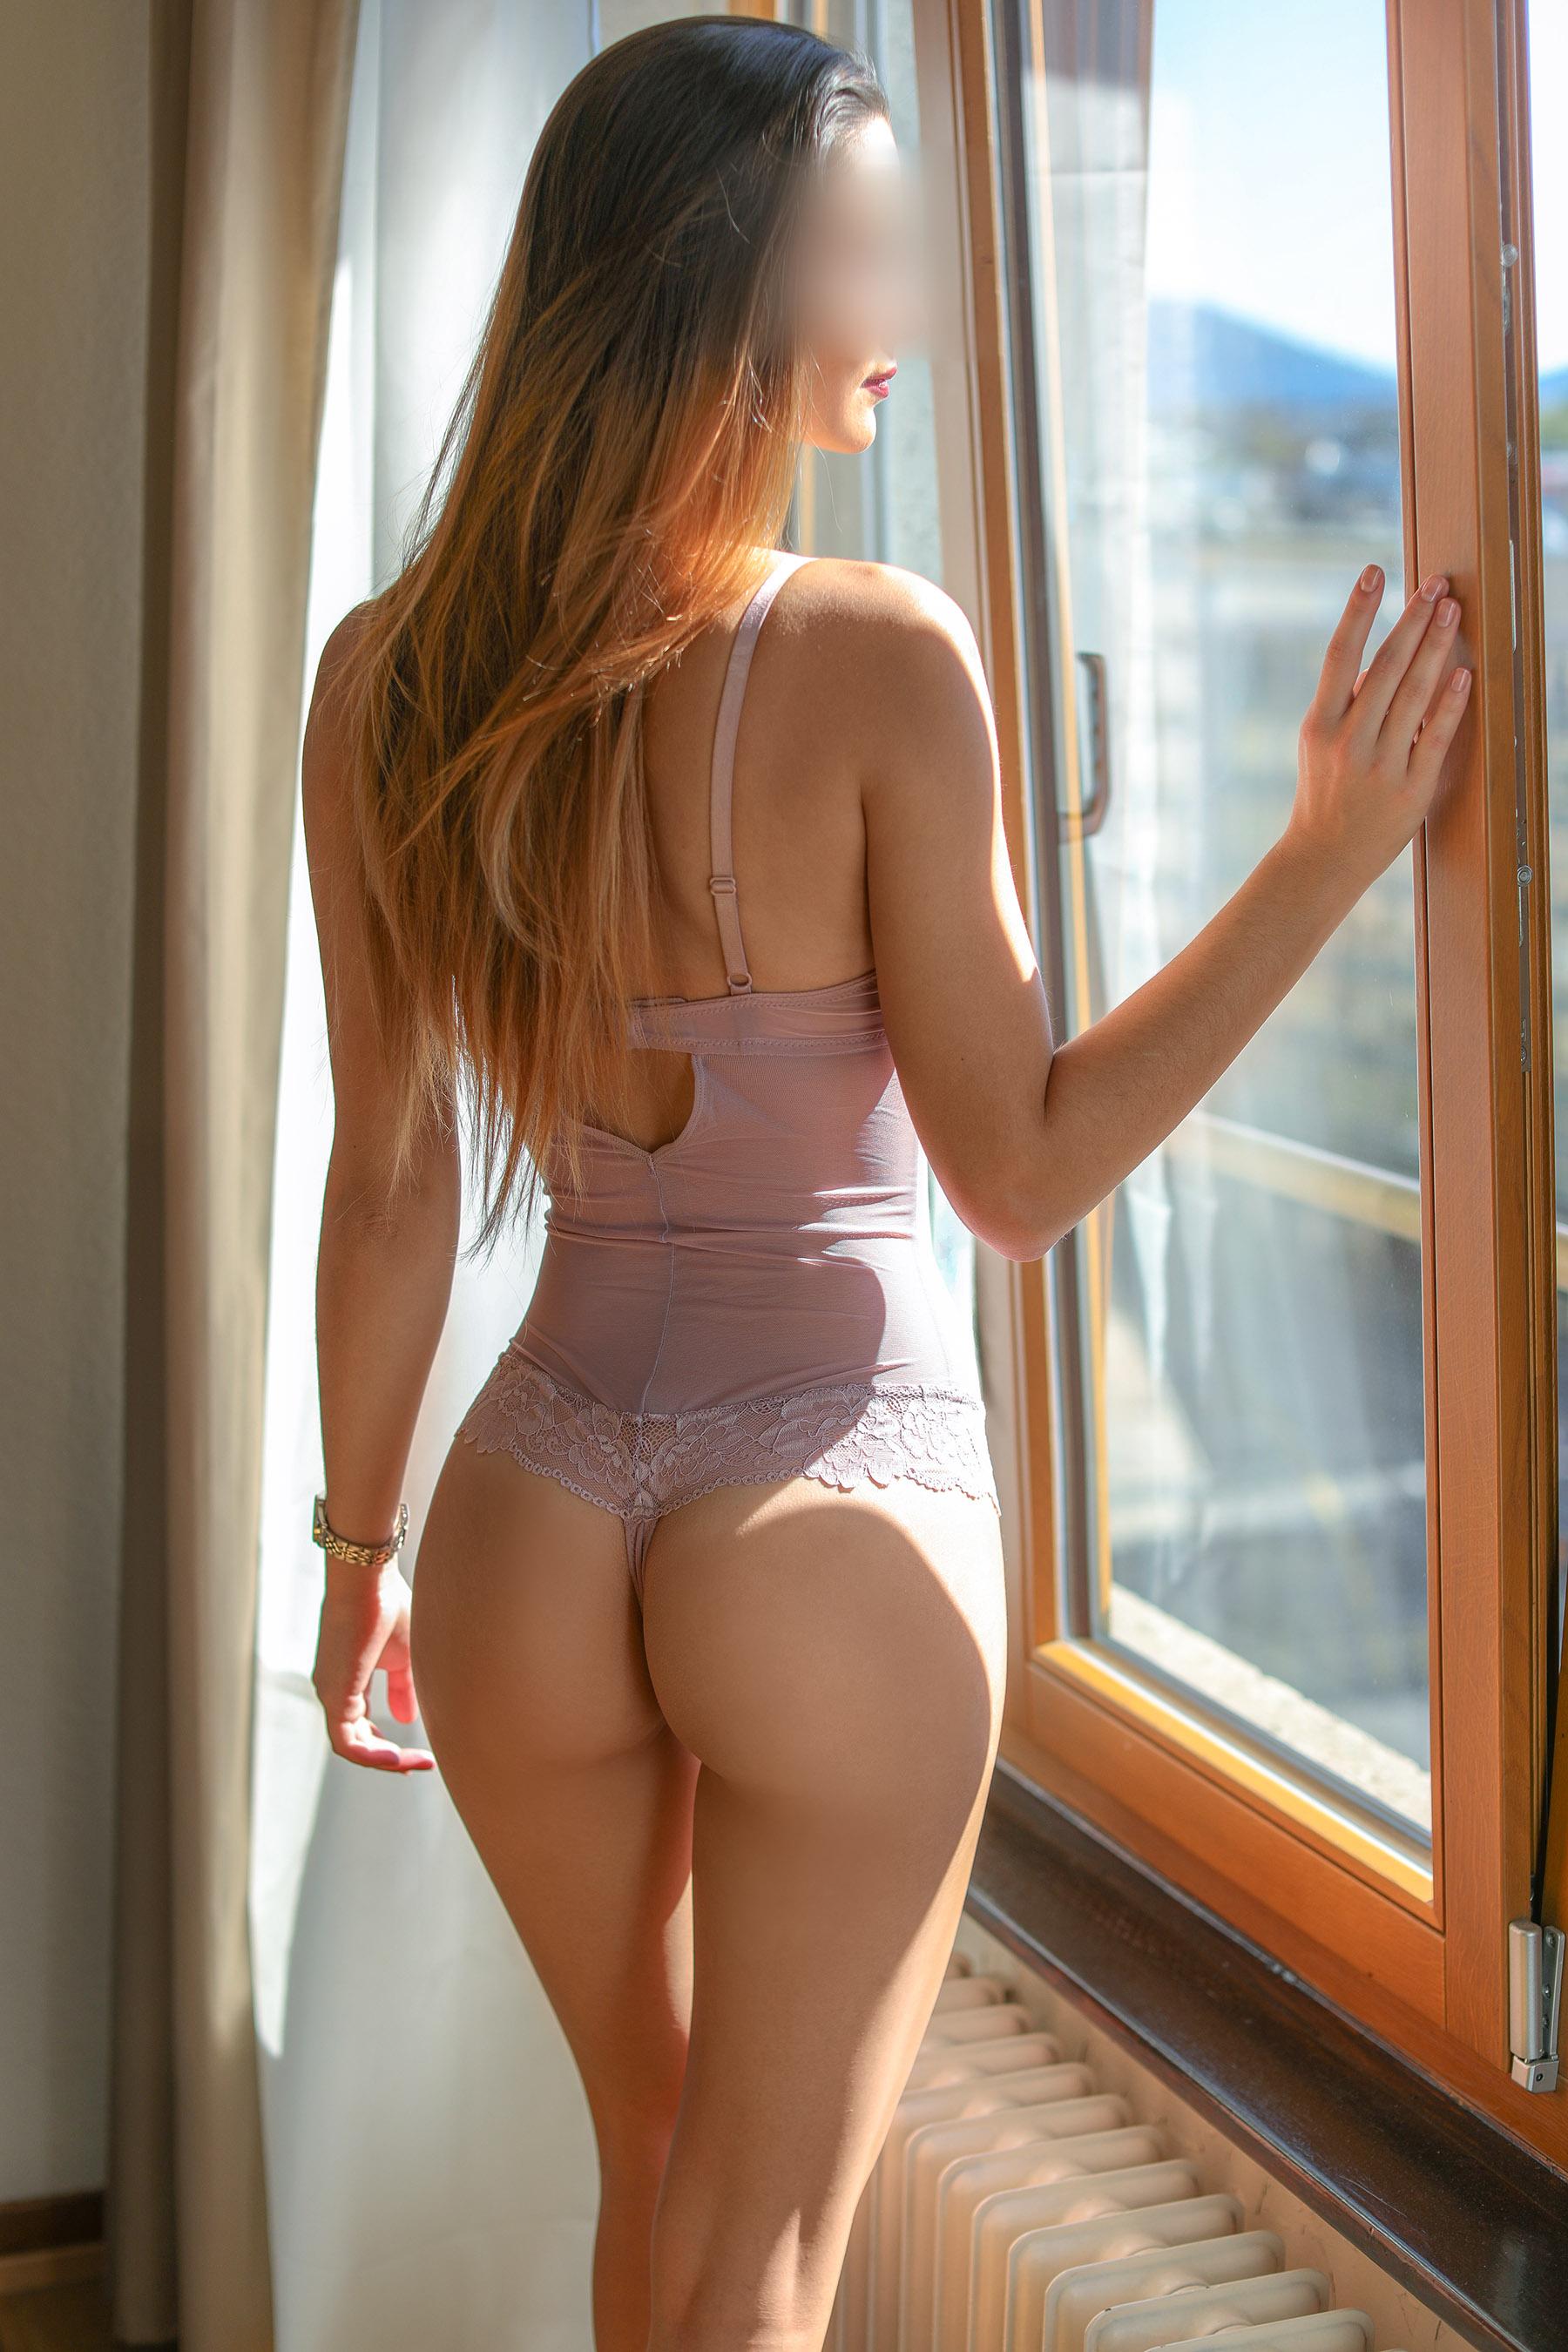 ilaria-dreams-agenzia-escort-lugano-torino-escorte-agency-2.jpg